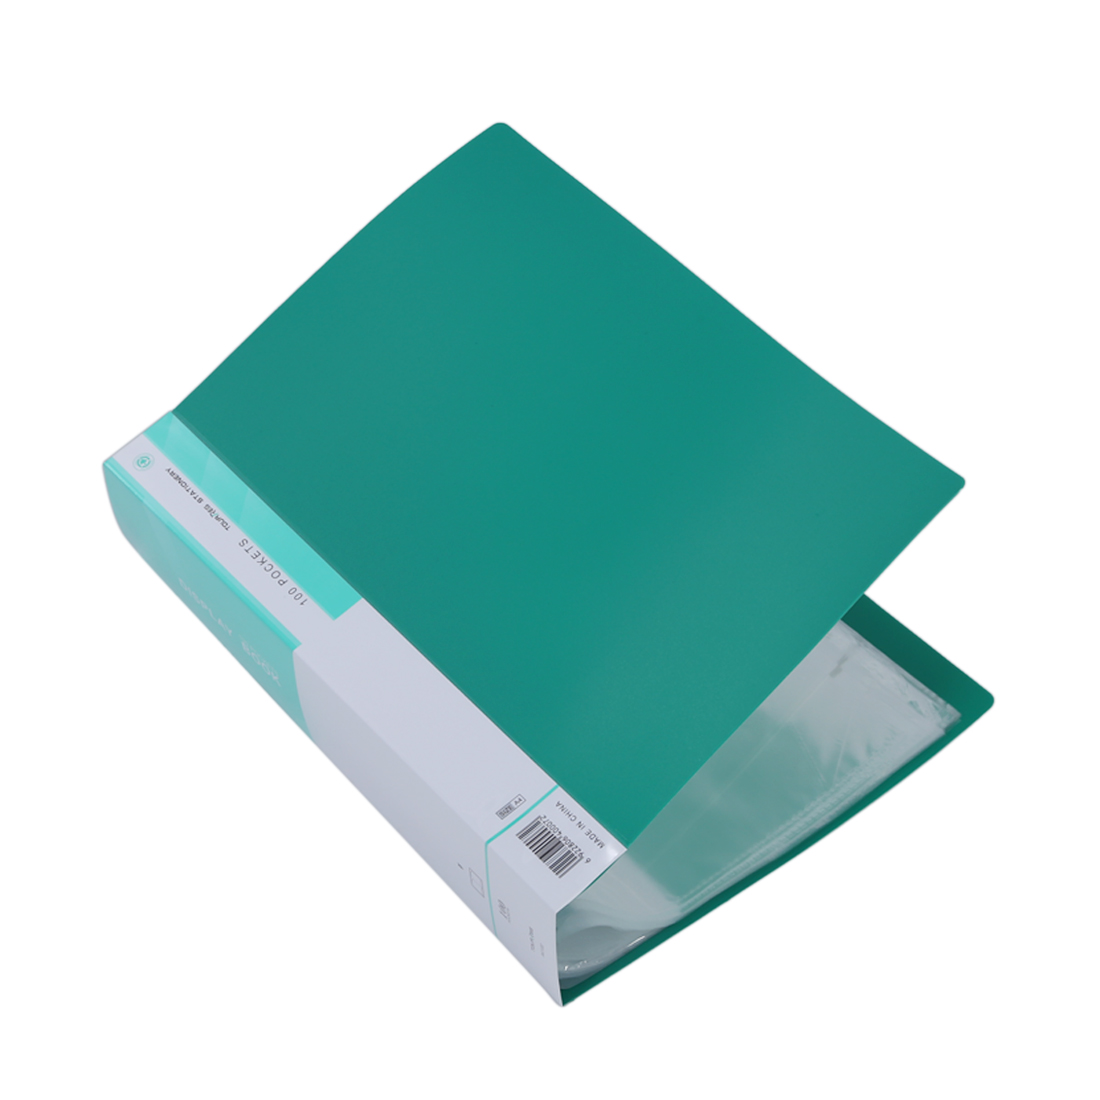 все цены на Wholesale 5pcs of A4 Display Book Presentation Documents Storage Portfolio Folder 100 Pockets онлайн